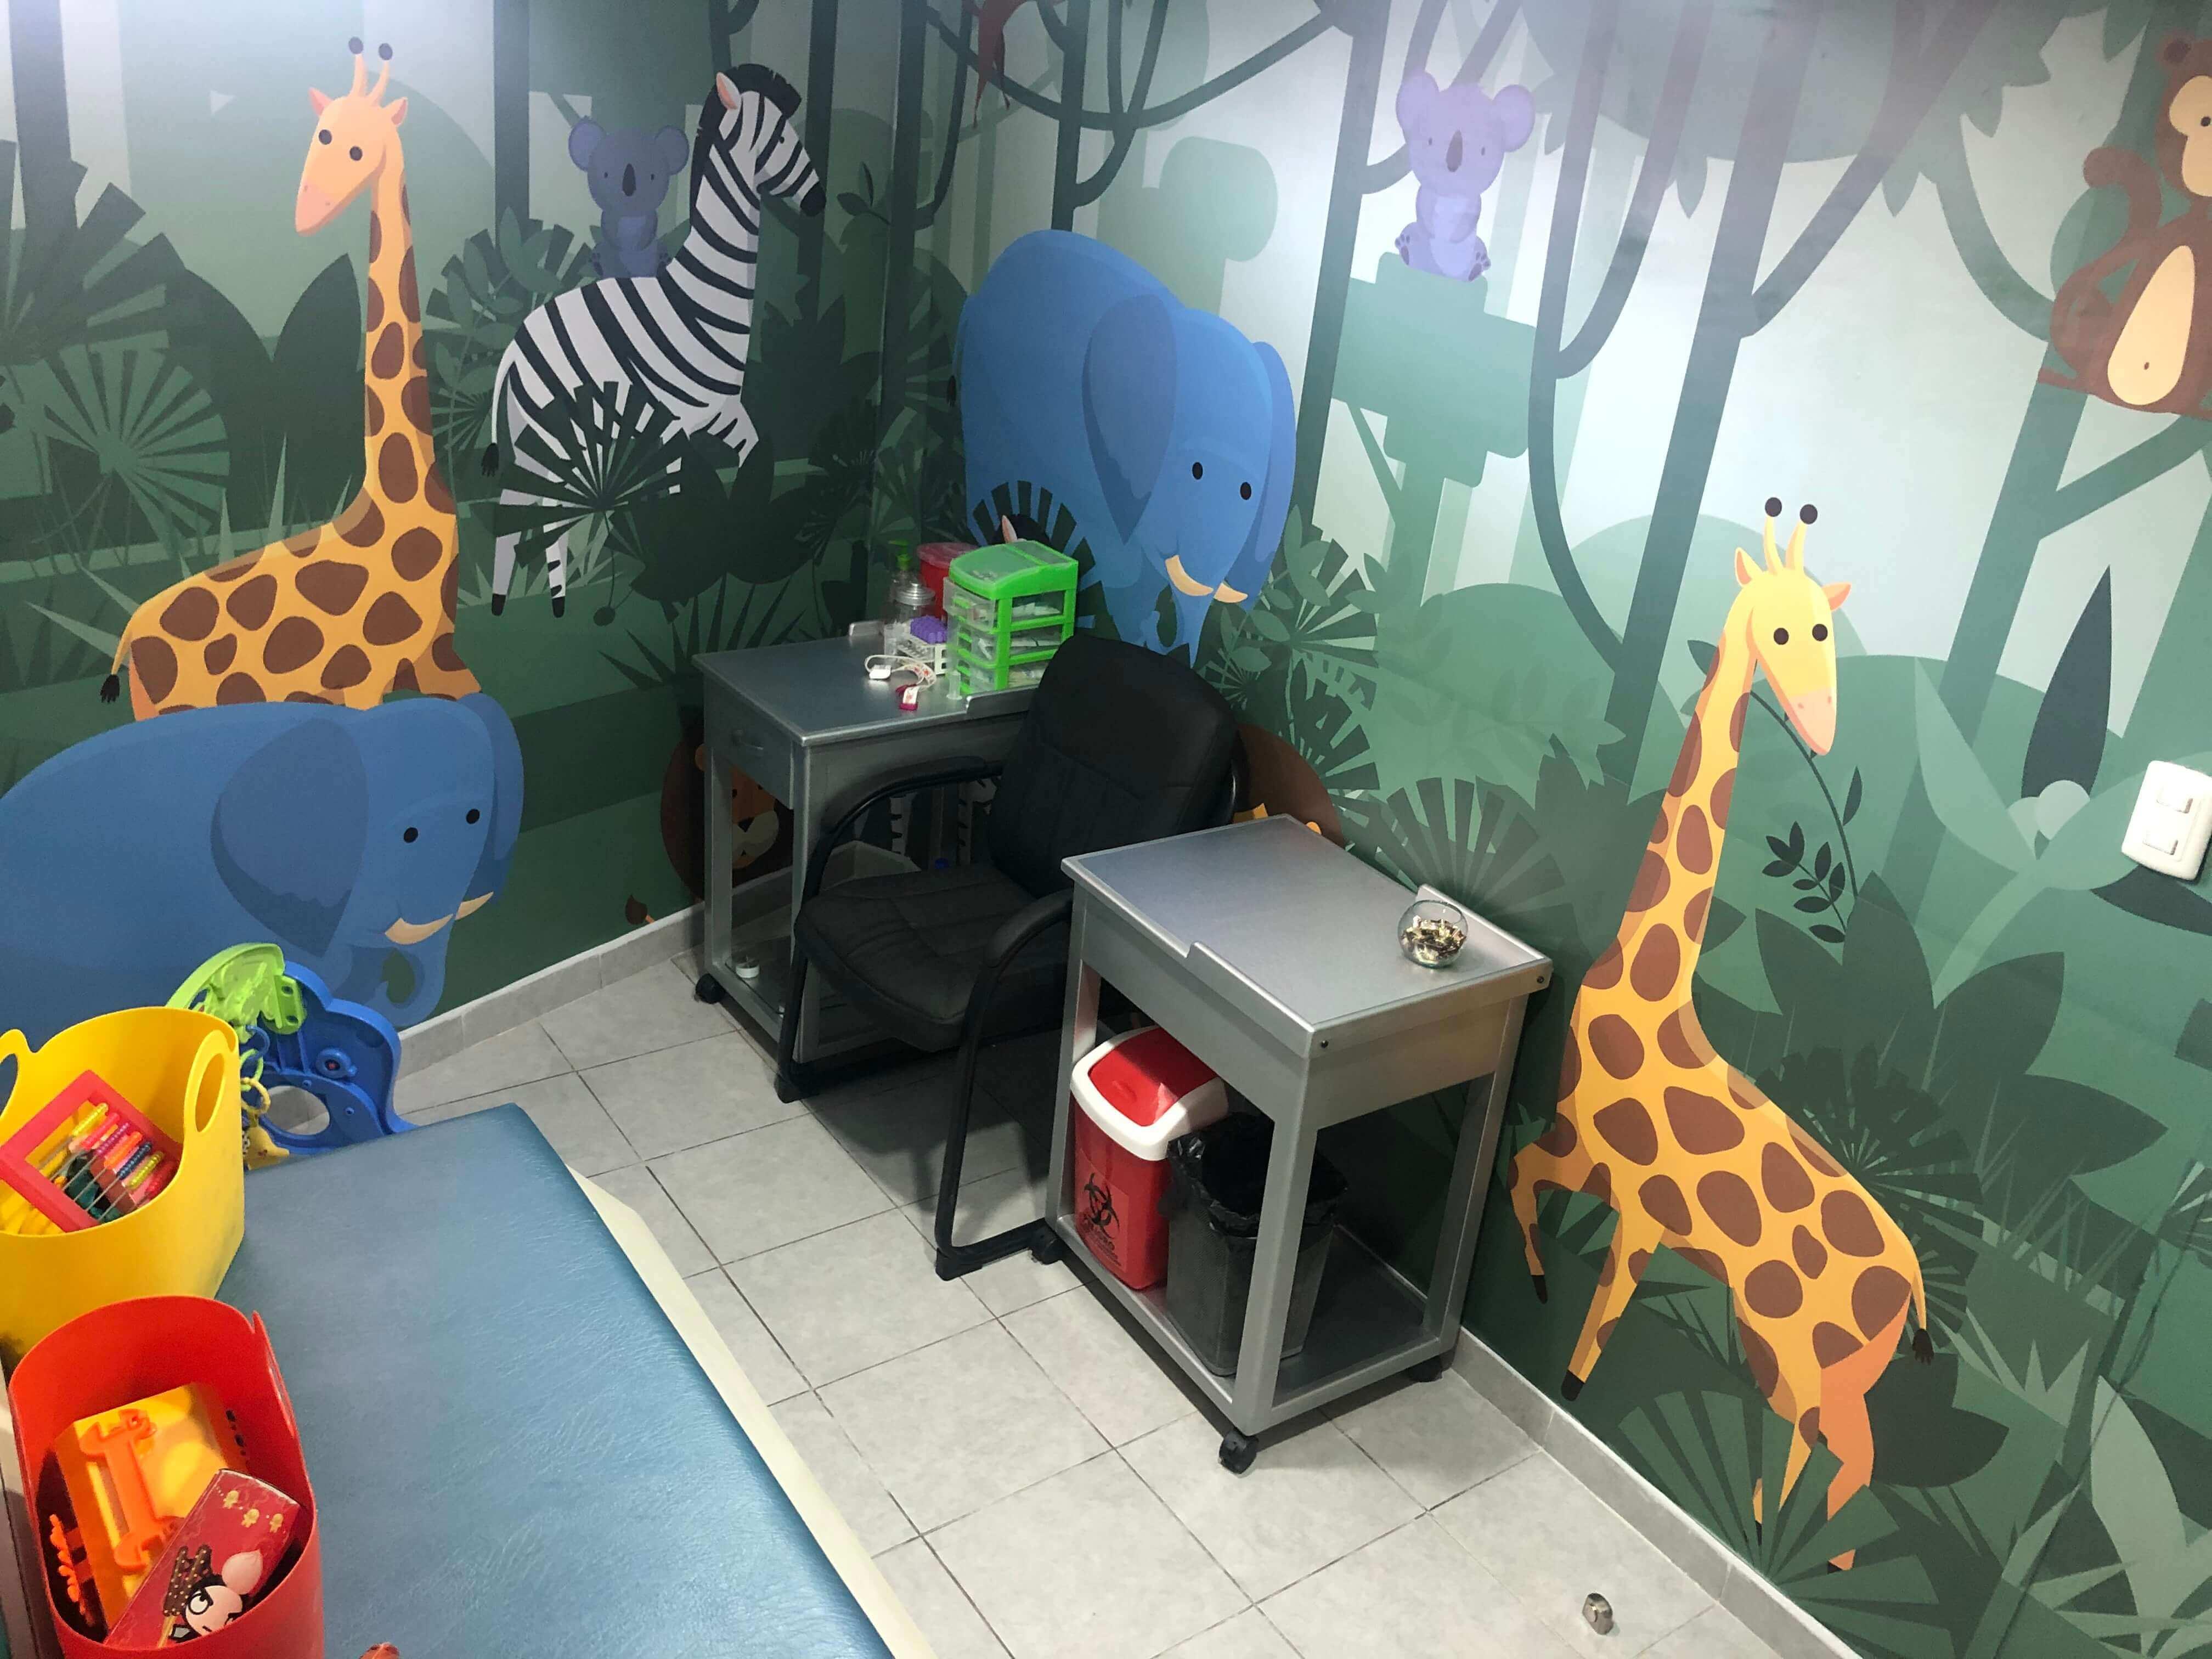 Laboratorio-biottek-area-pediatrica-alameda-cordoba.jpg